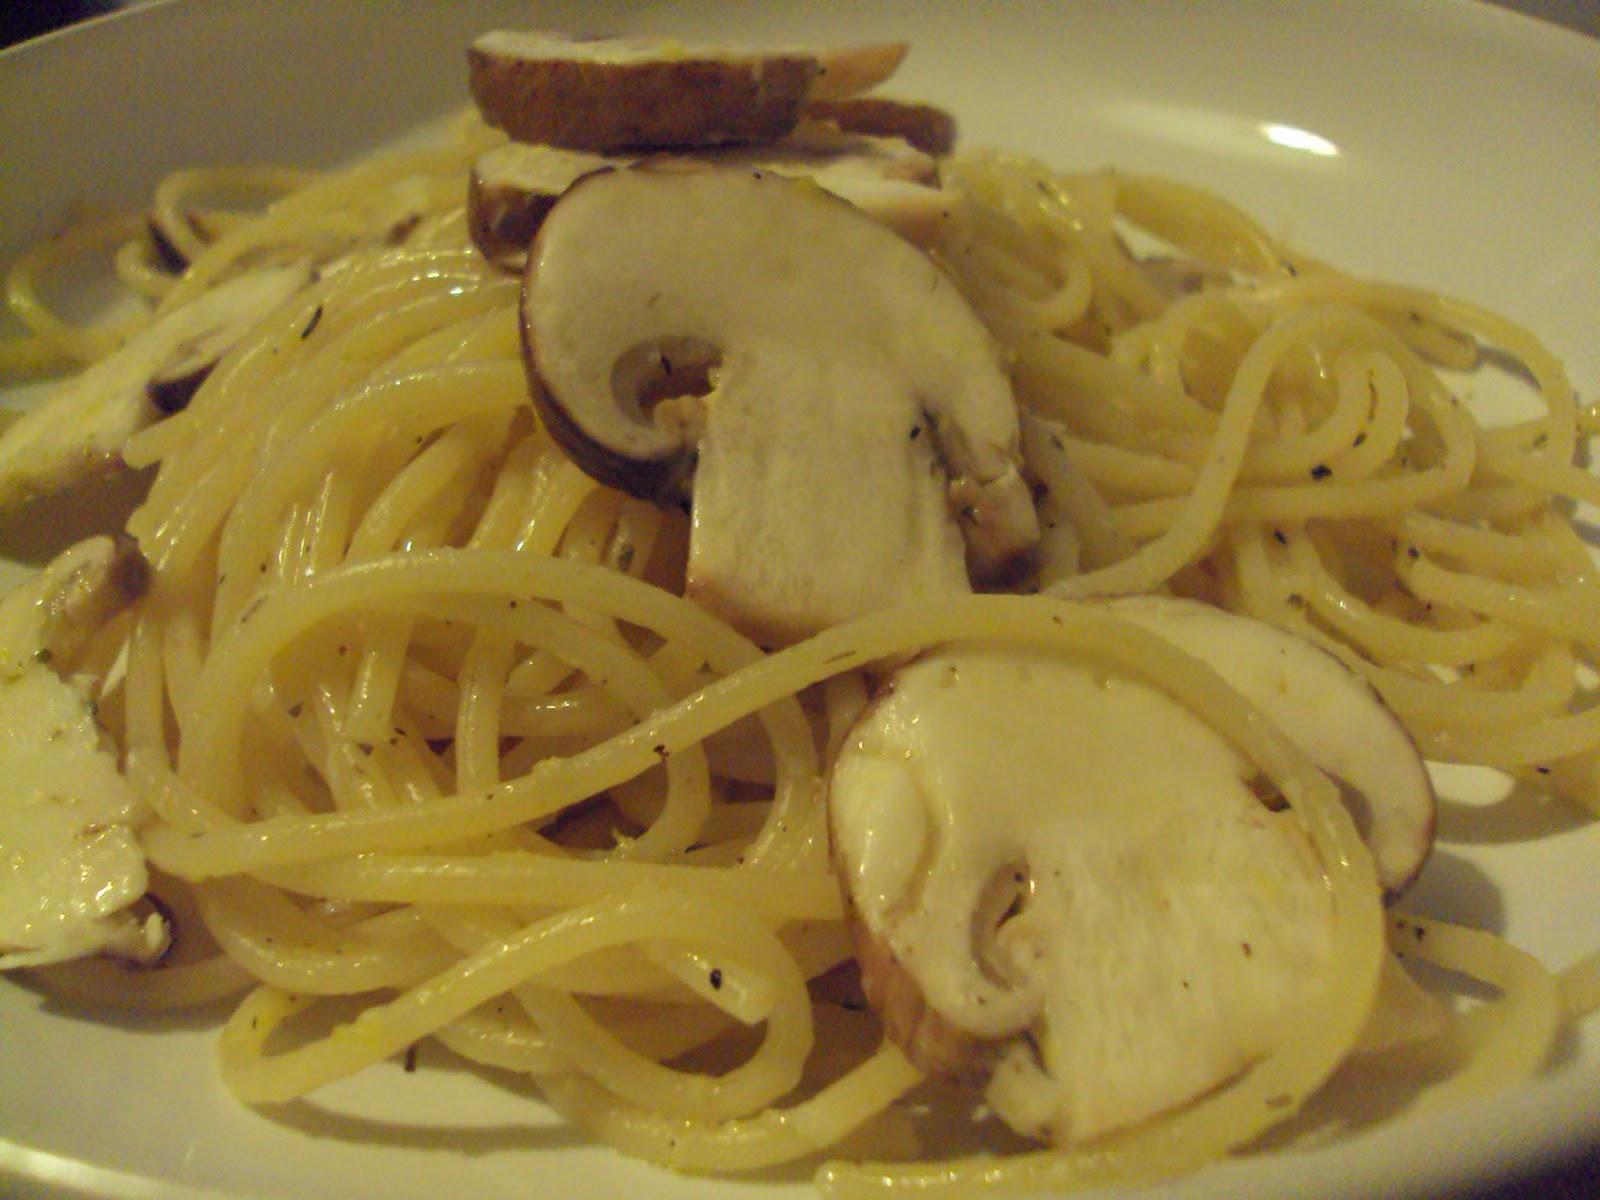 Linguine+with+lemon%2C+garlic+and+thyme+mushrooms.JPG